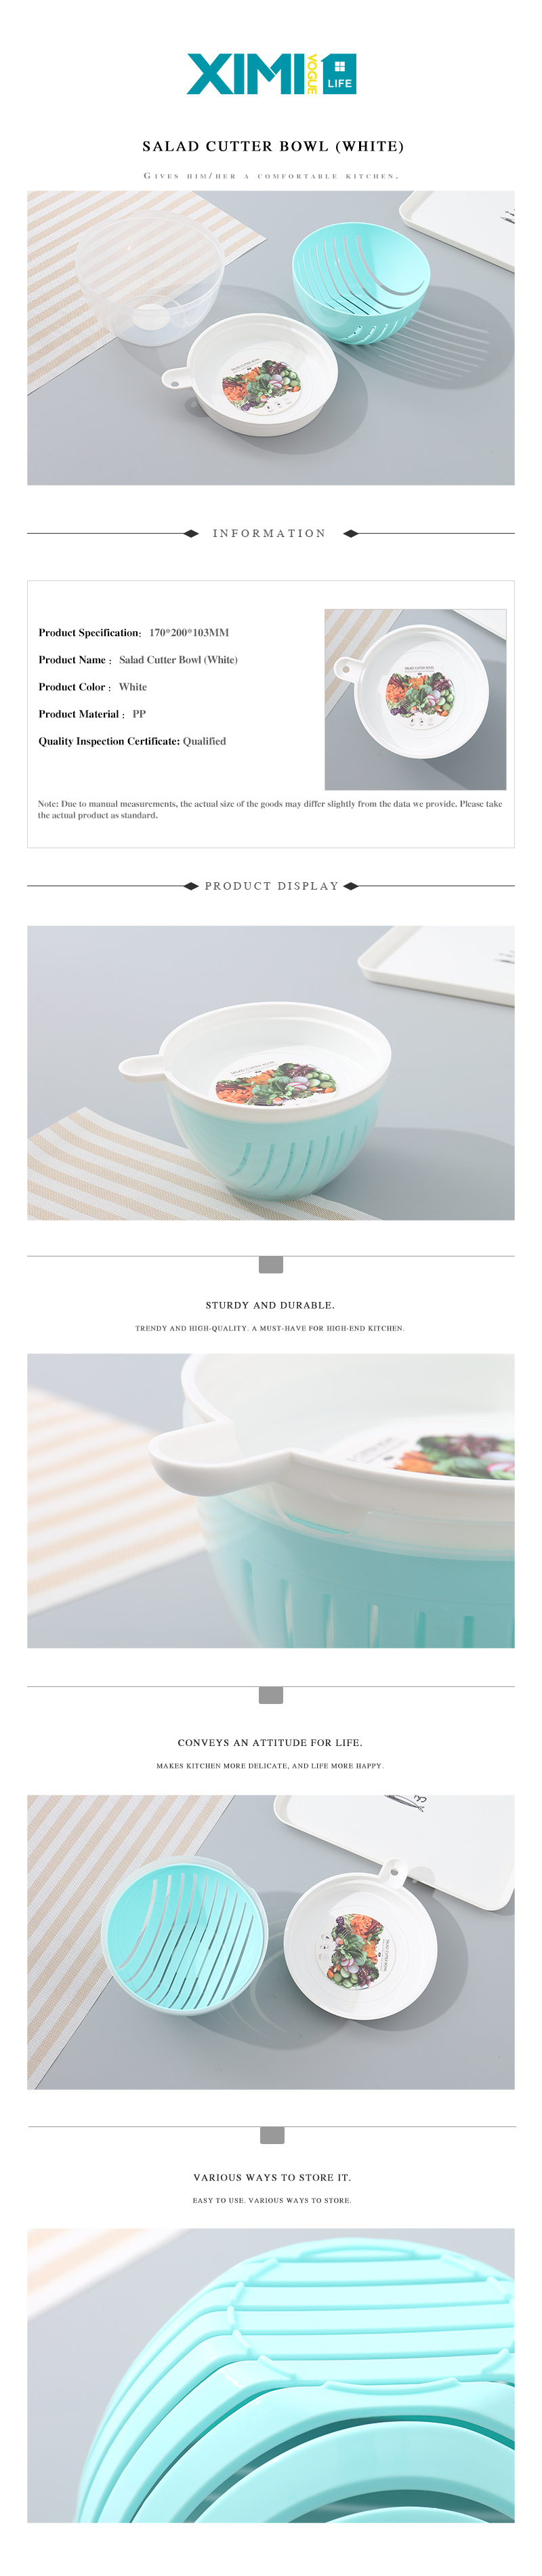 Salad Cutter Bowl (White)